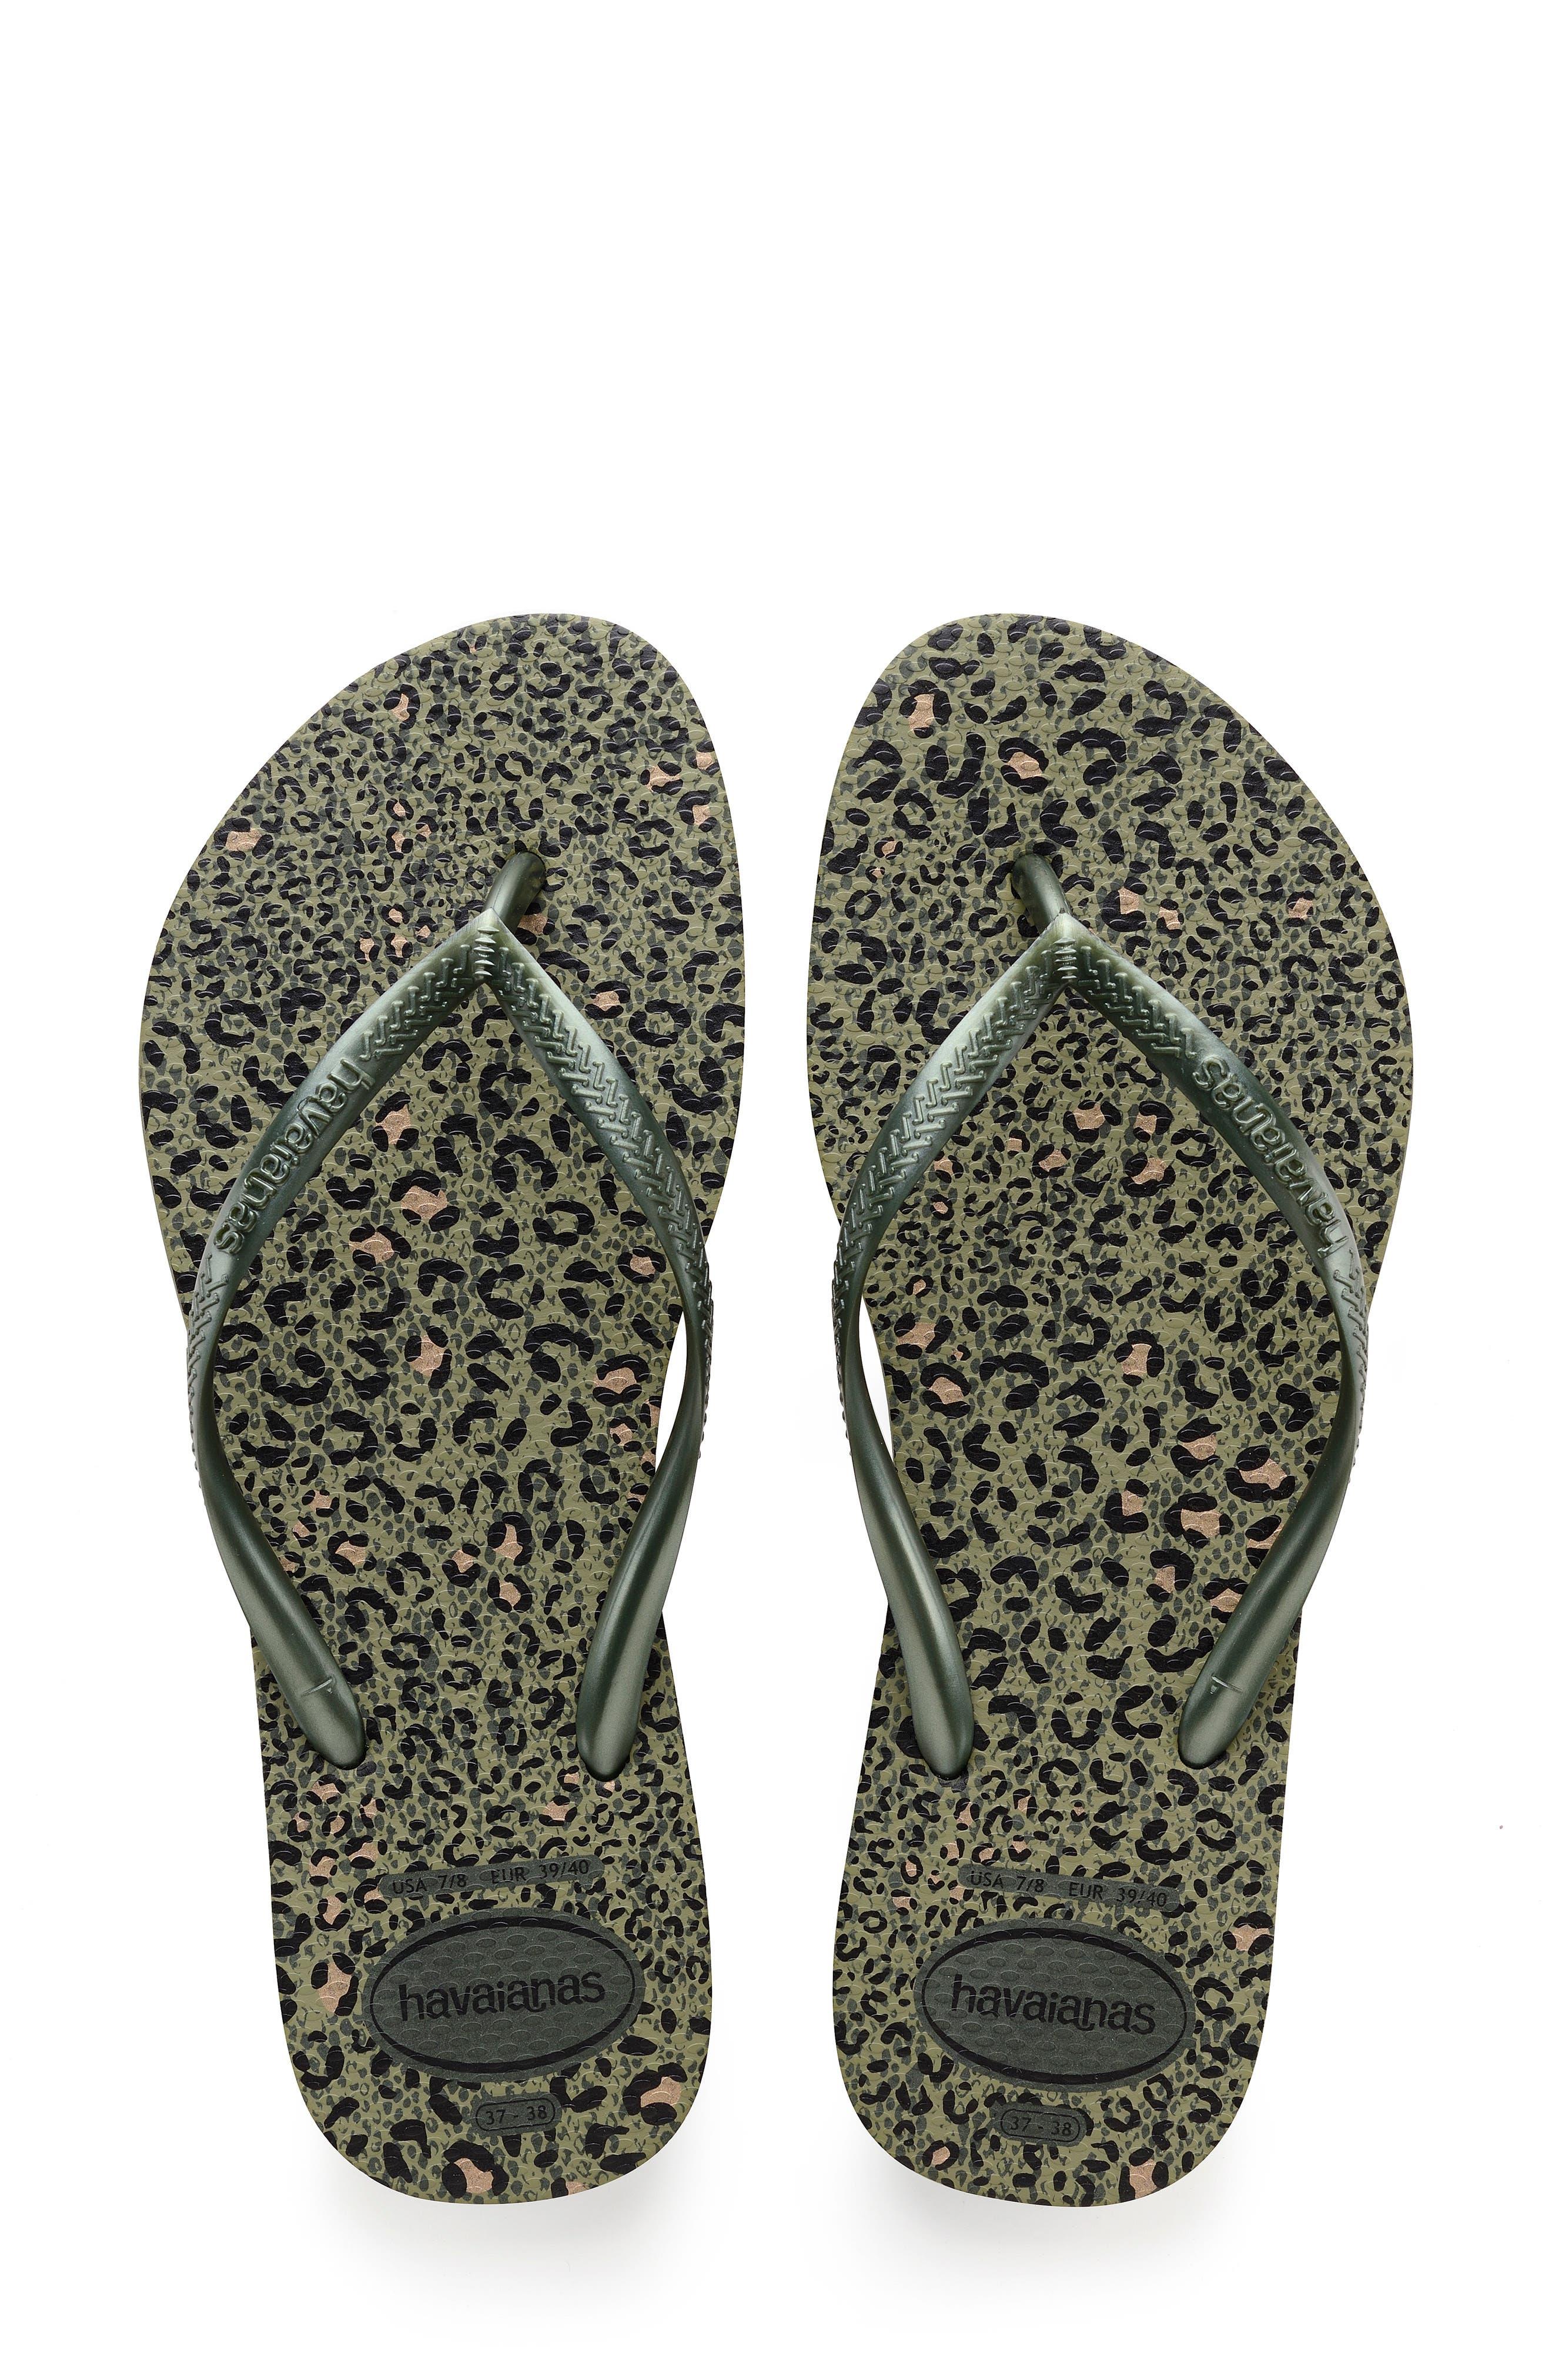 dab6161d8167b Havaianas Flip-Flops for Women